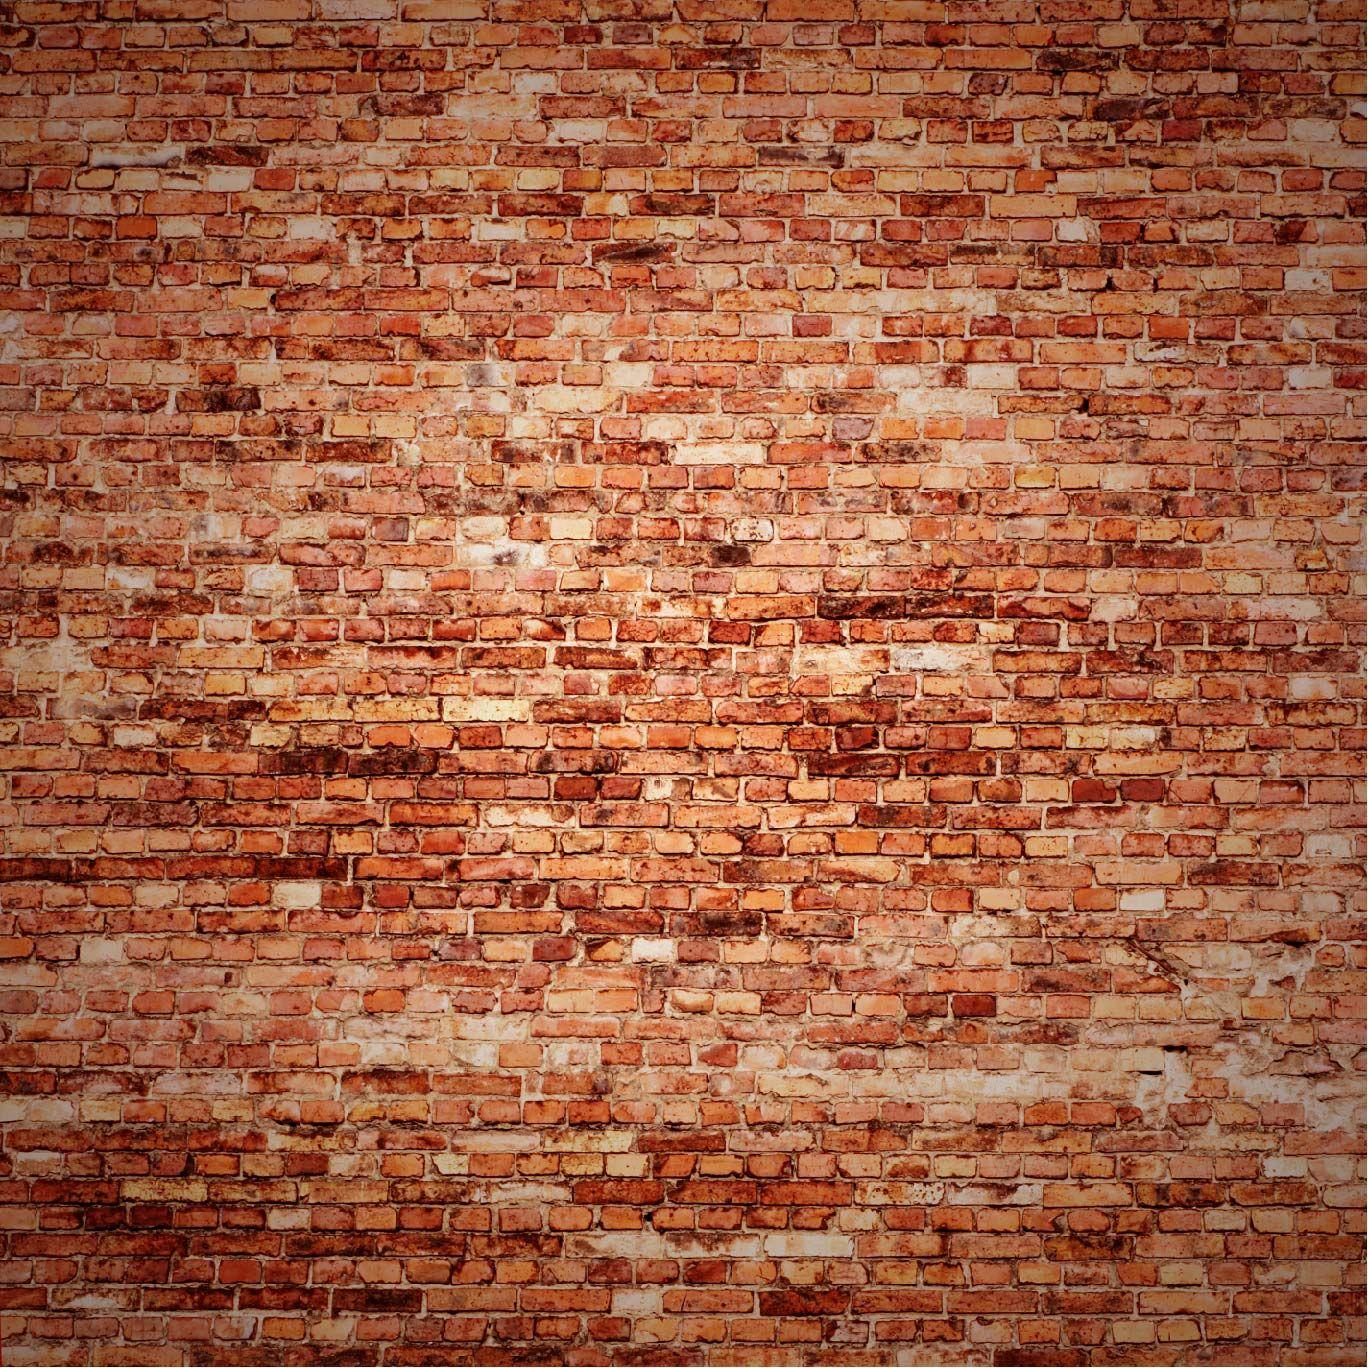 Papel mural ladrillos bricks pinterest papel mural - Ladrillo visto interior ...